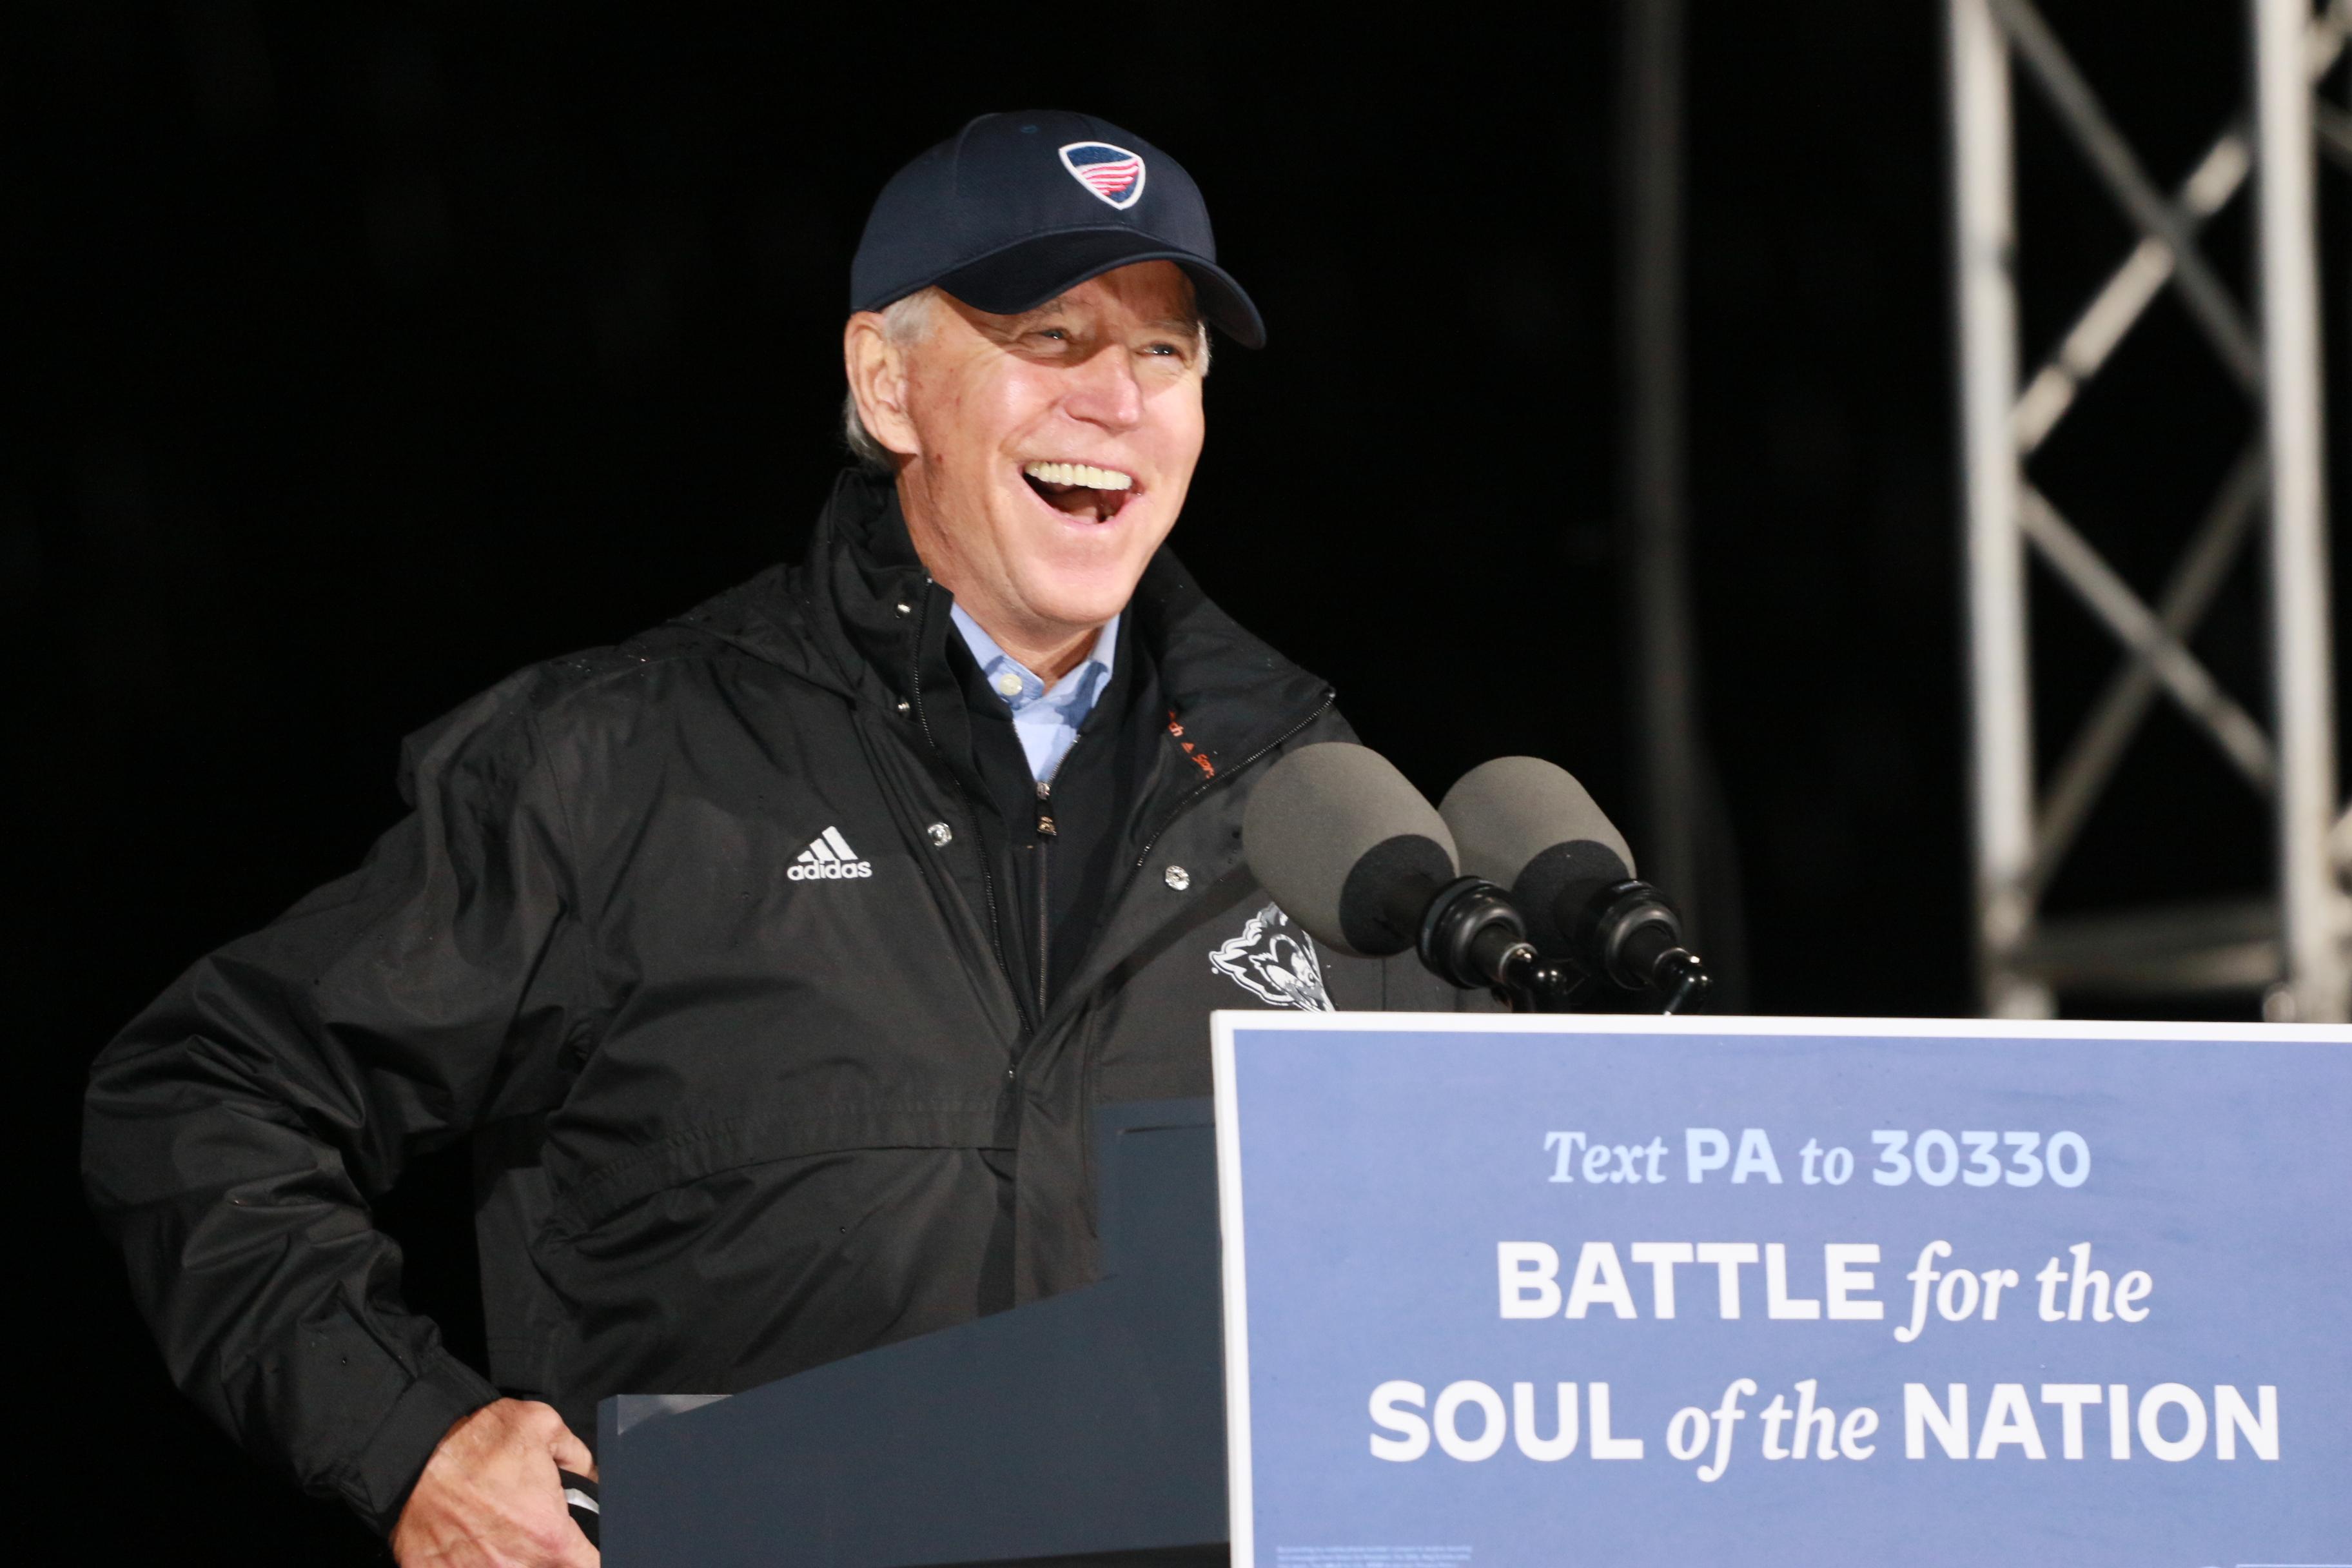 Former Vice President Joe Biden has a Drive thru rally at the Jewish Society Museum in Philadelphia